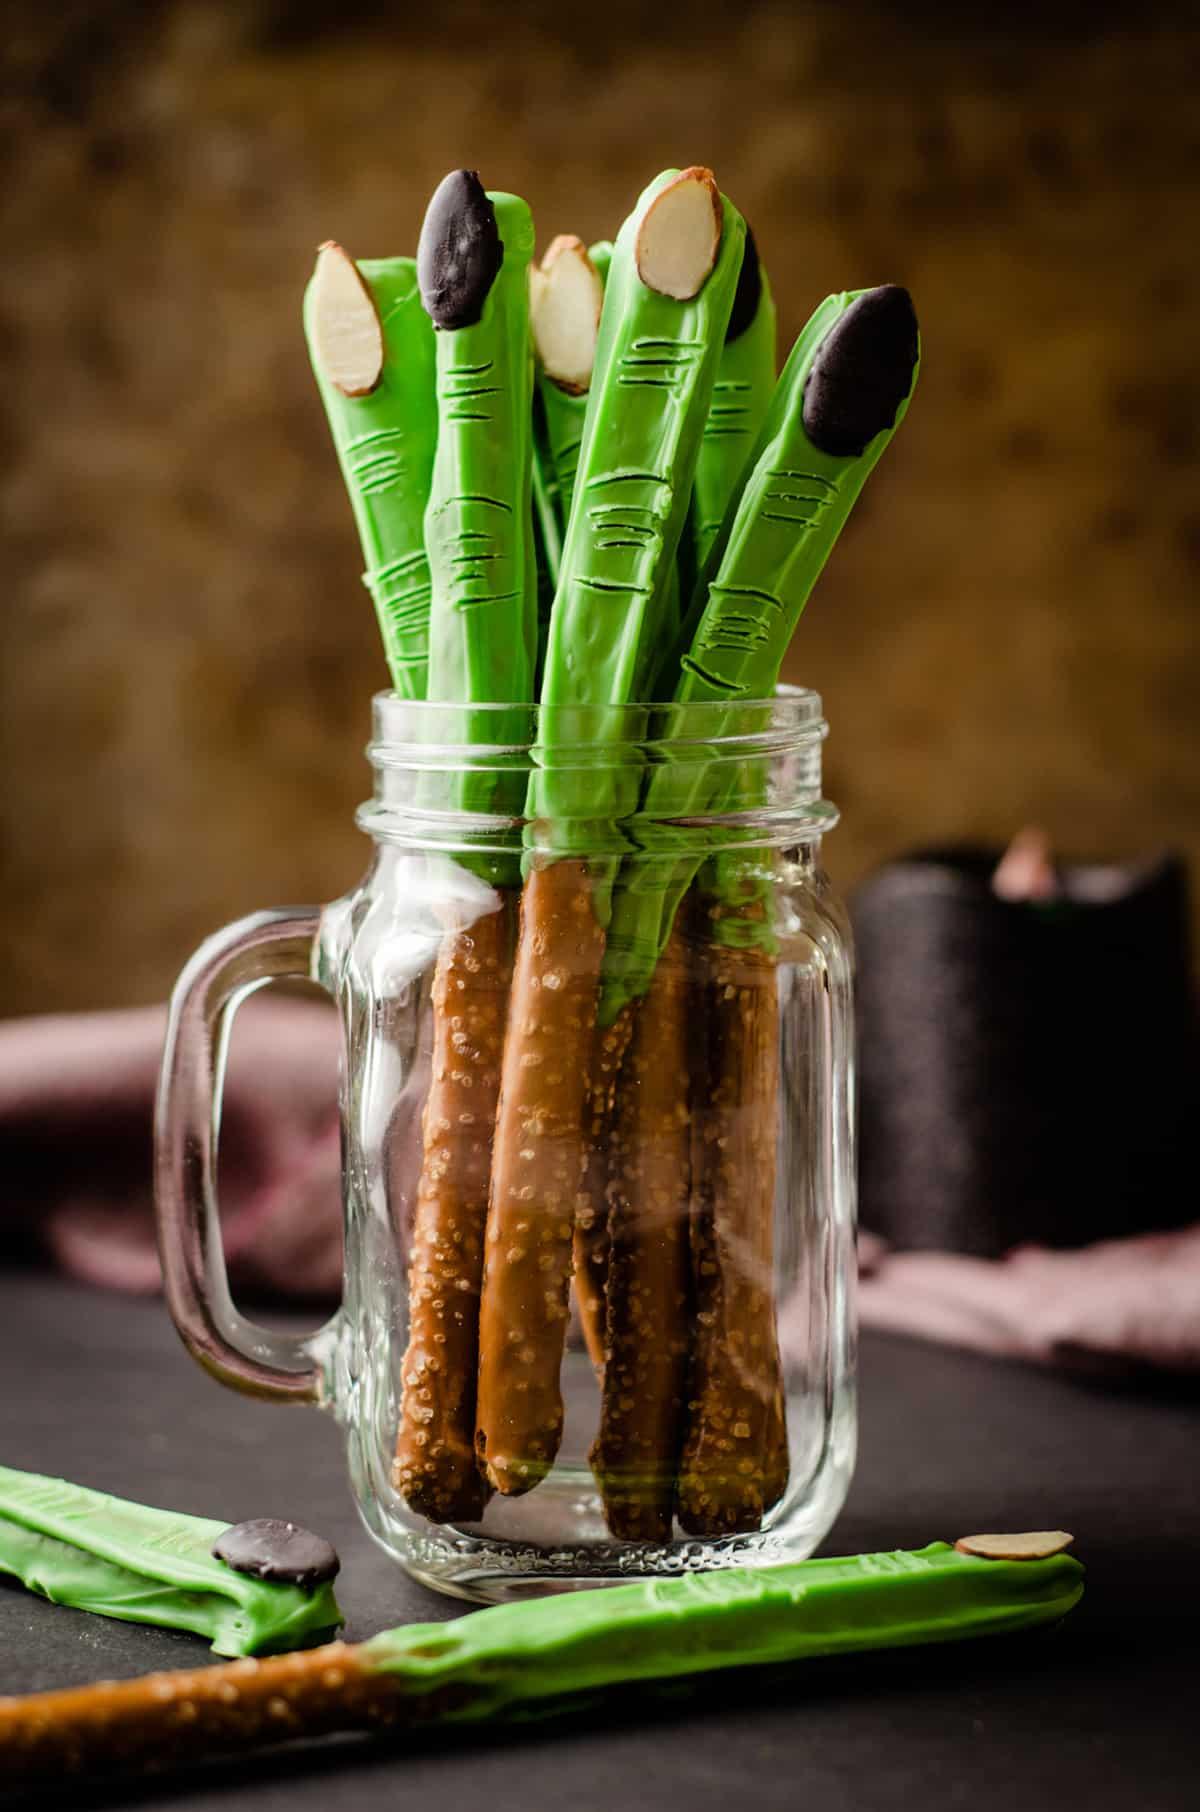 witch finger pretzels in a glass jar